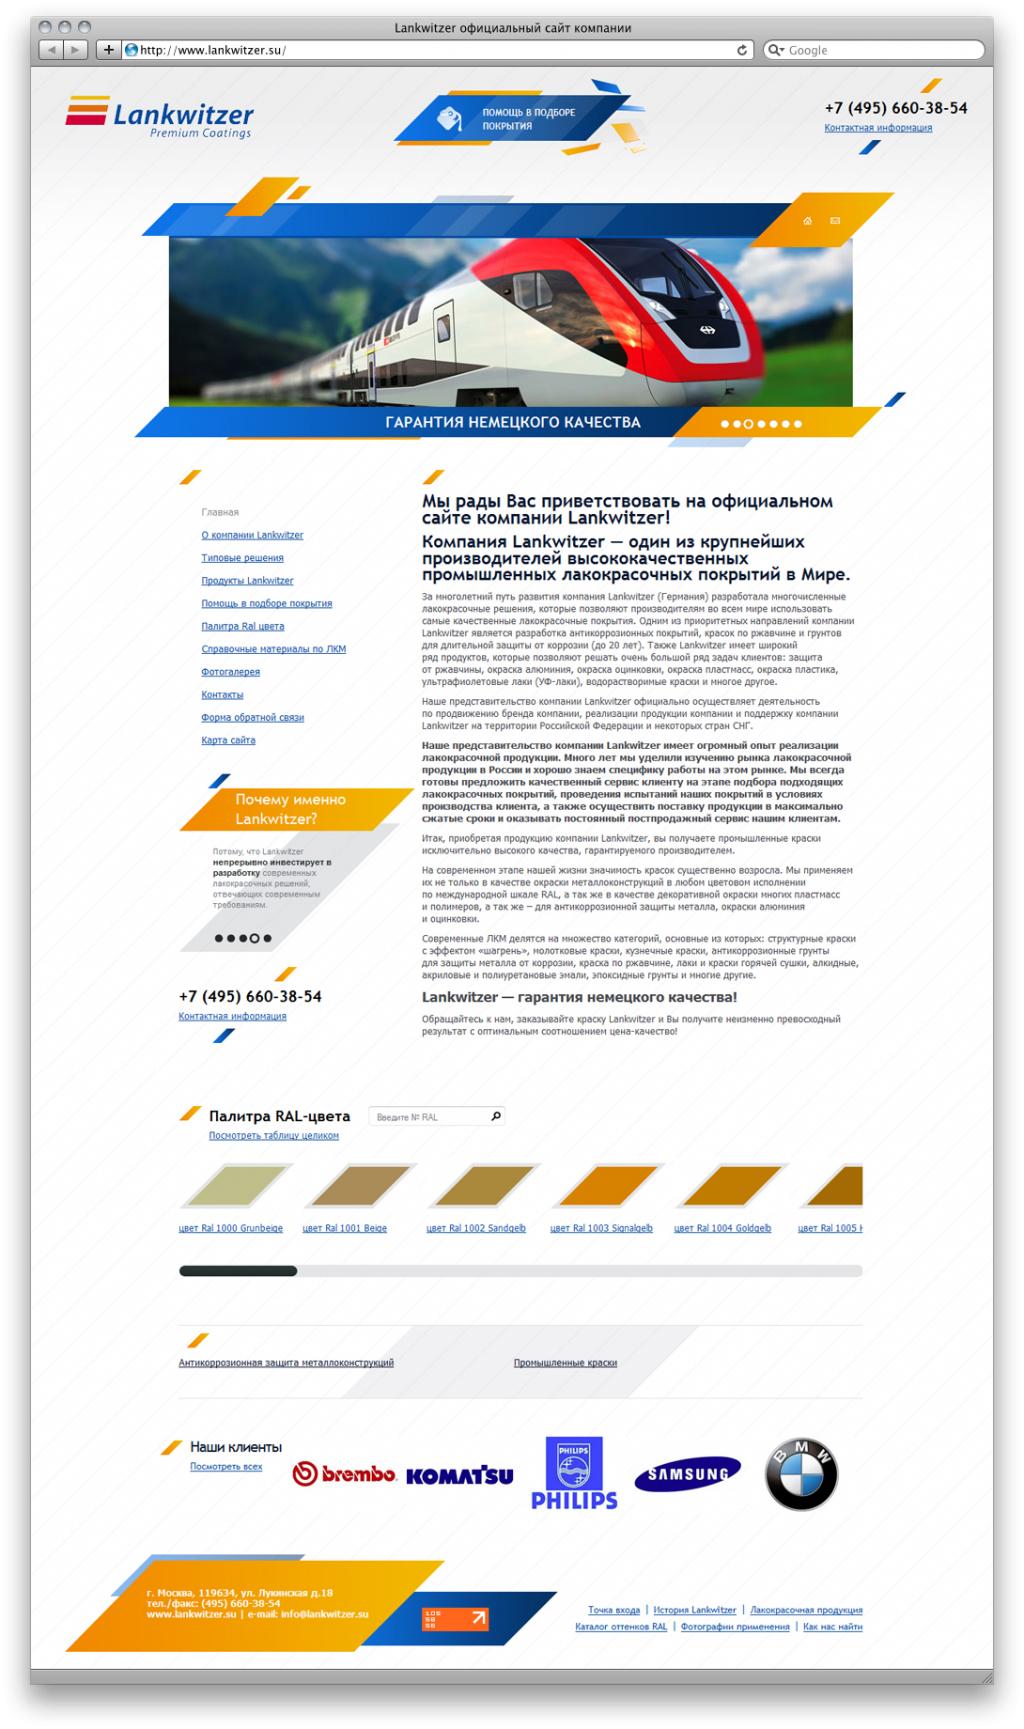 Lankwitzer Lackgruppe оцициальный сайт